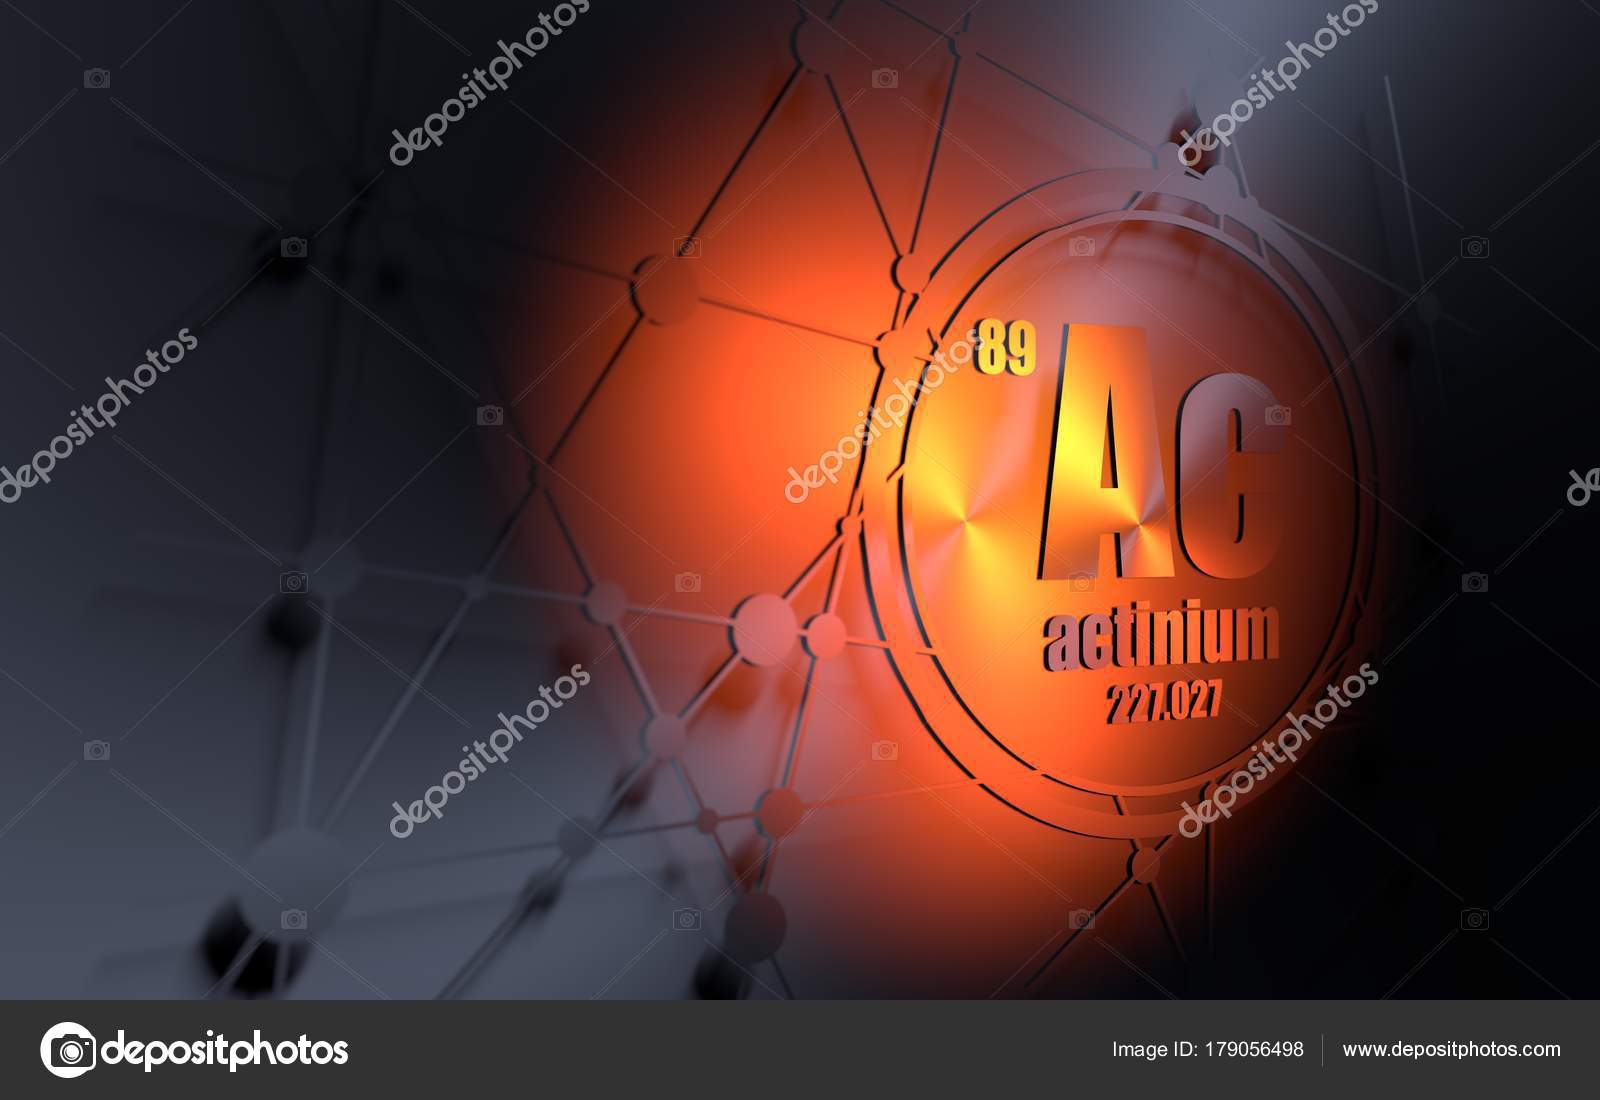 Actinium Chemical Element Stock Photo Jegasra 179056498